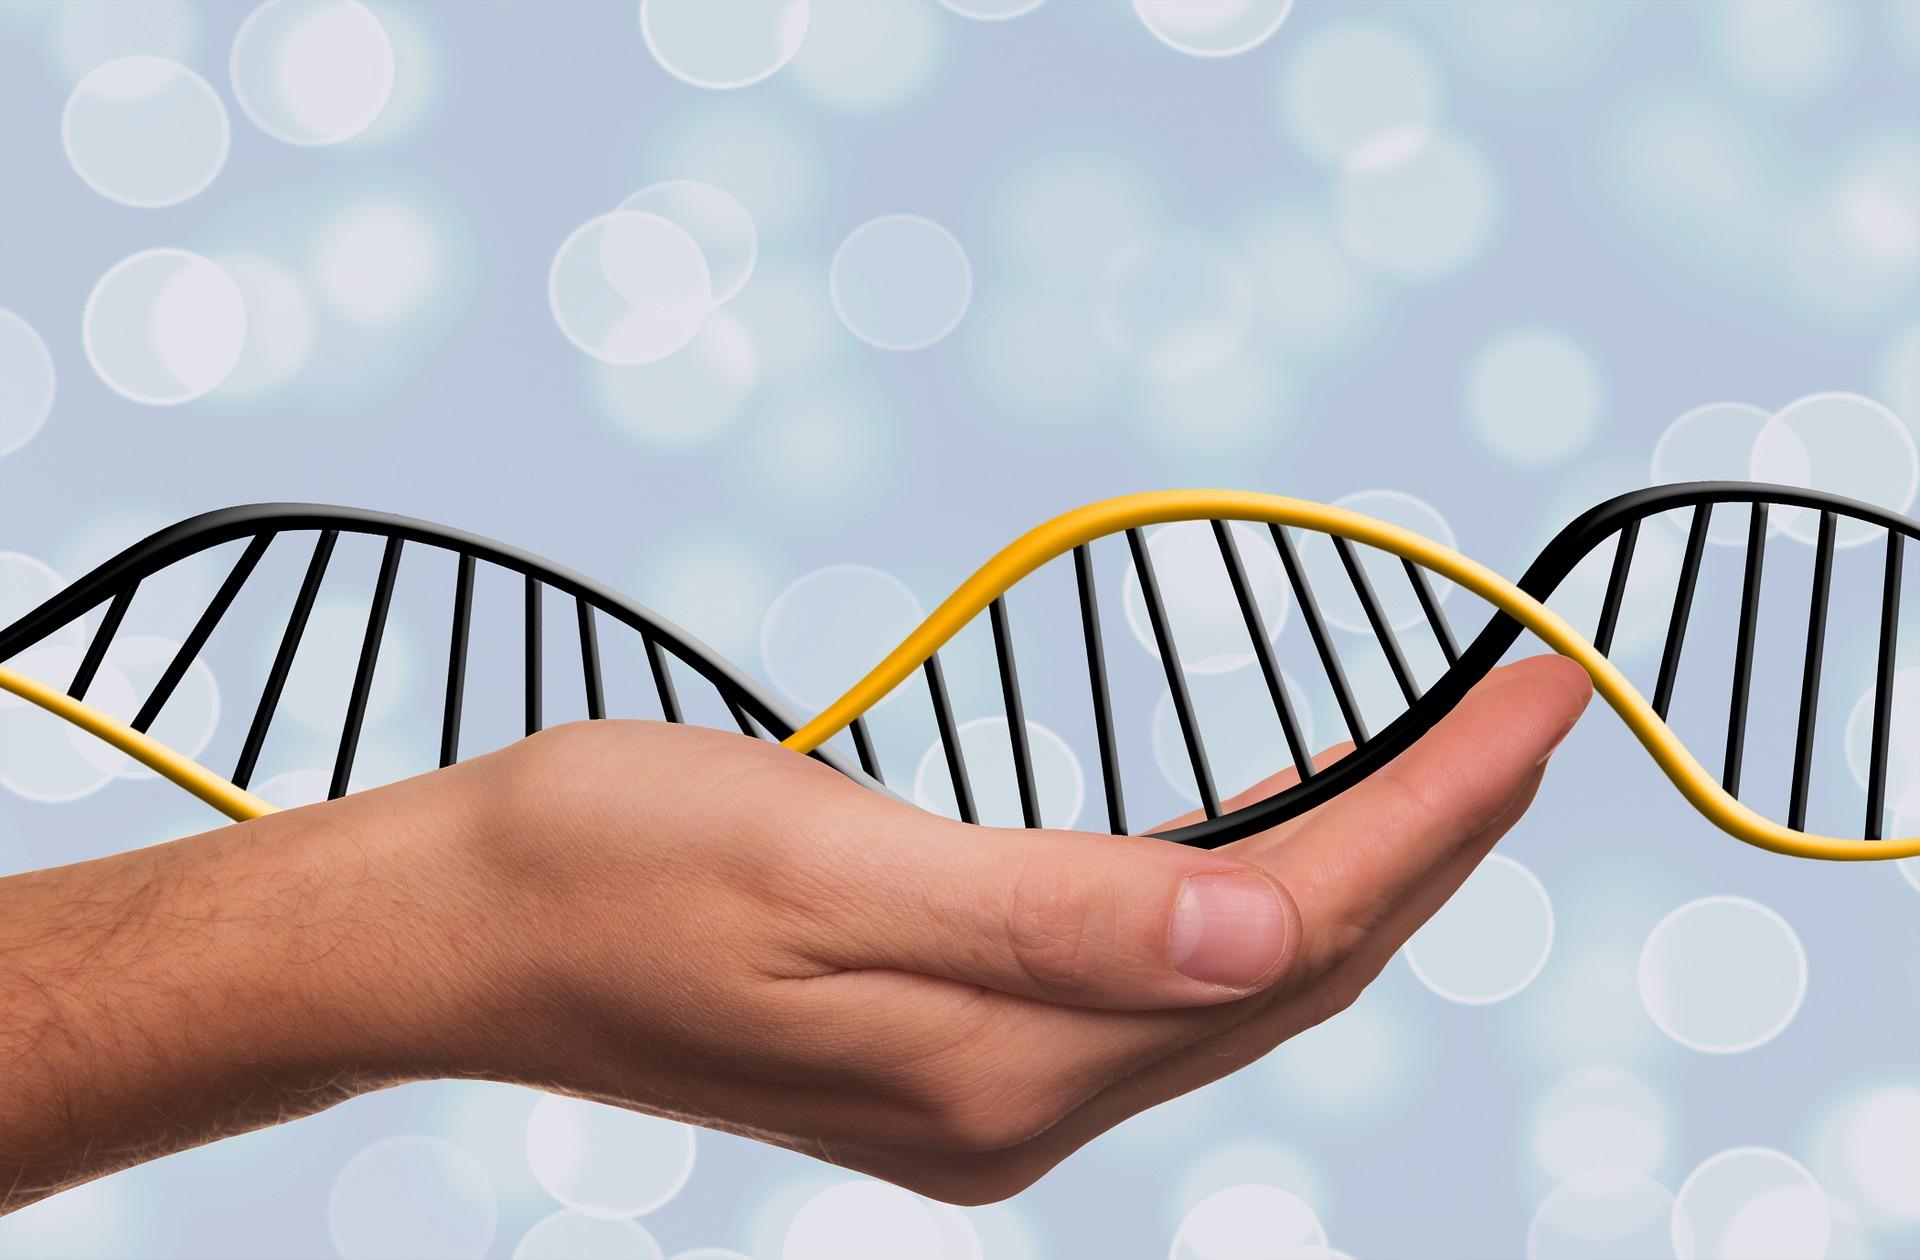 deoxyribonucleic-acid-1500076_1920